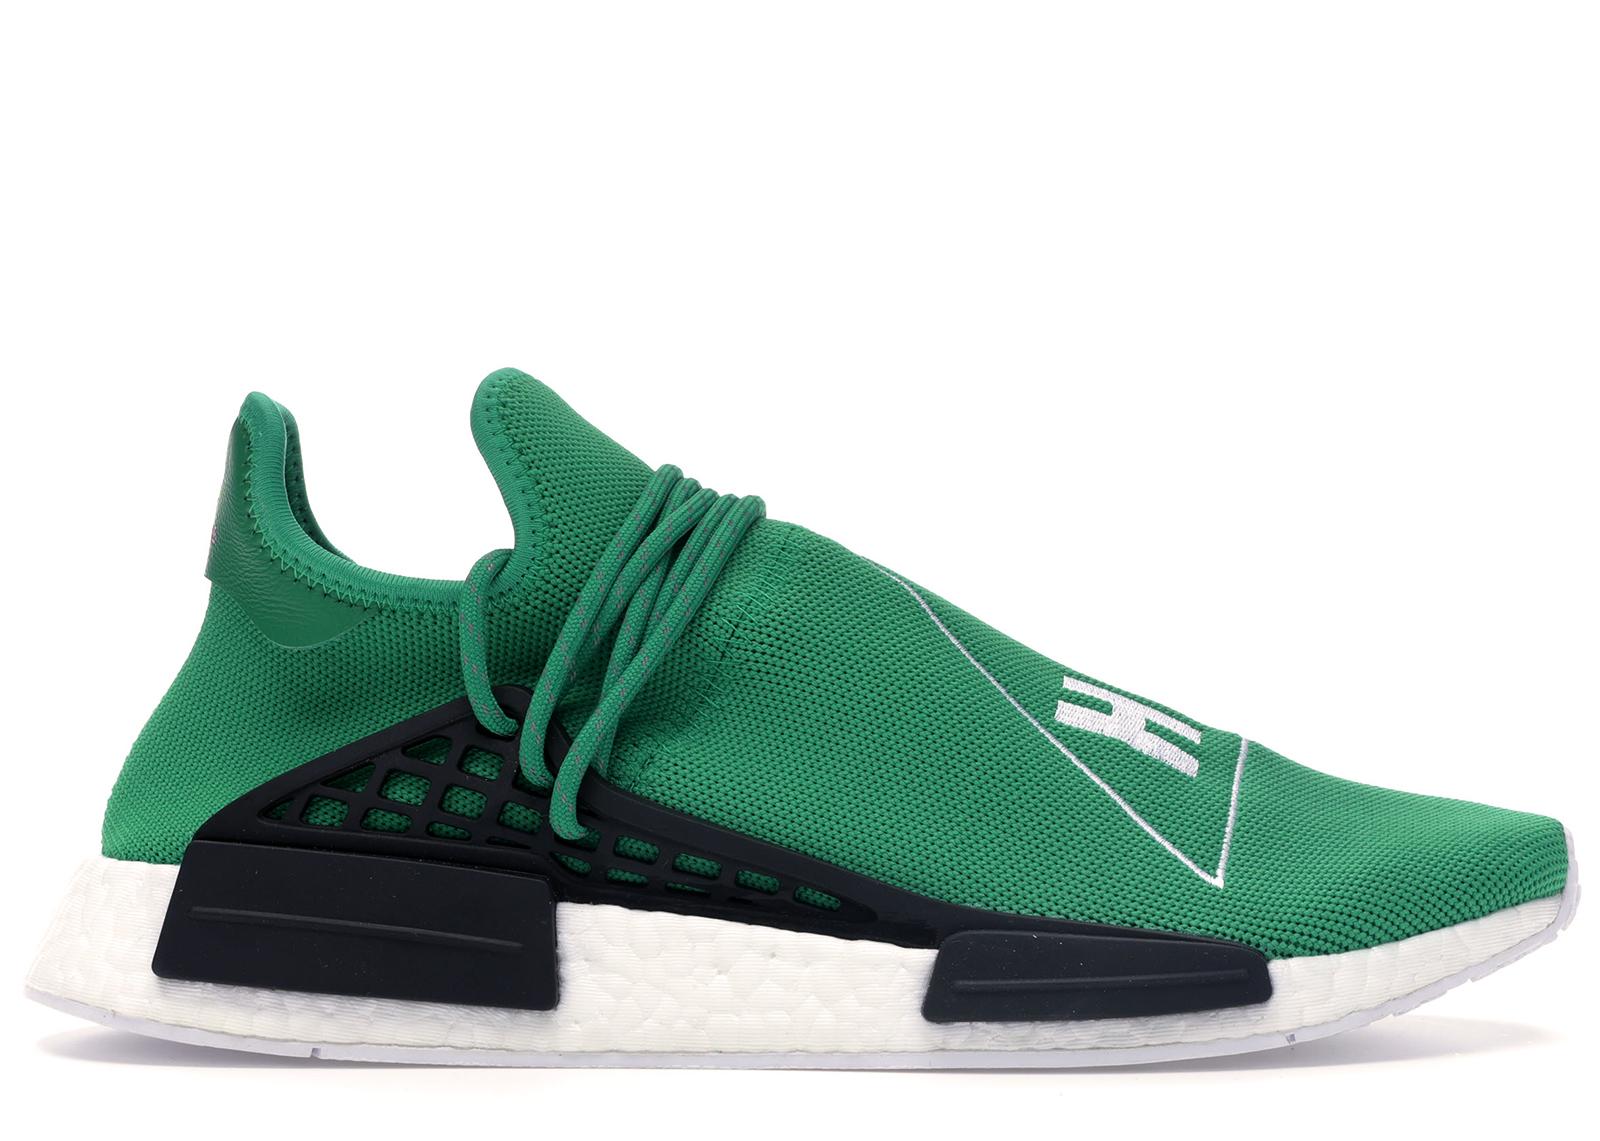 Ladrillo condado emprender  pharrell williams green adidas cheap online